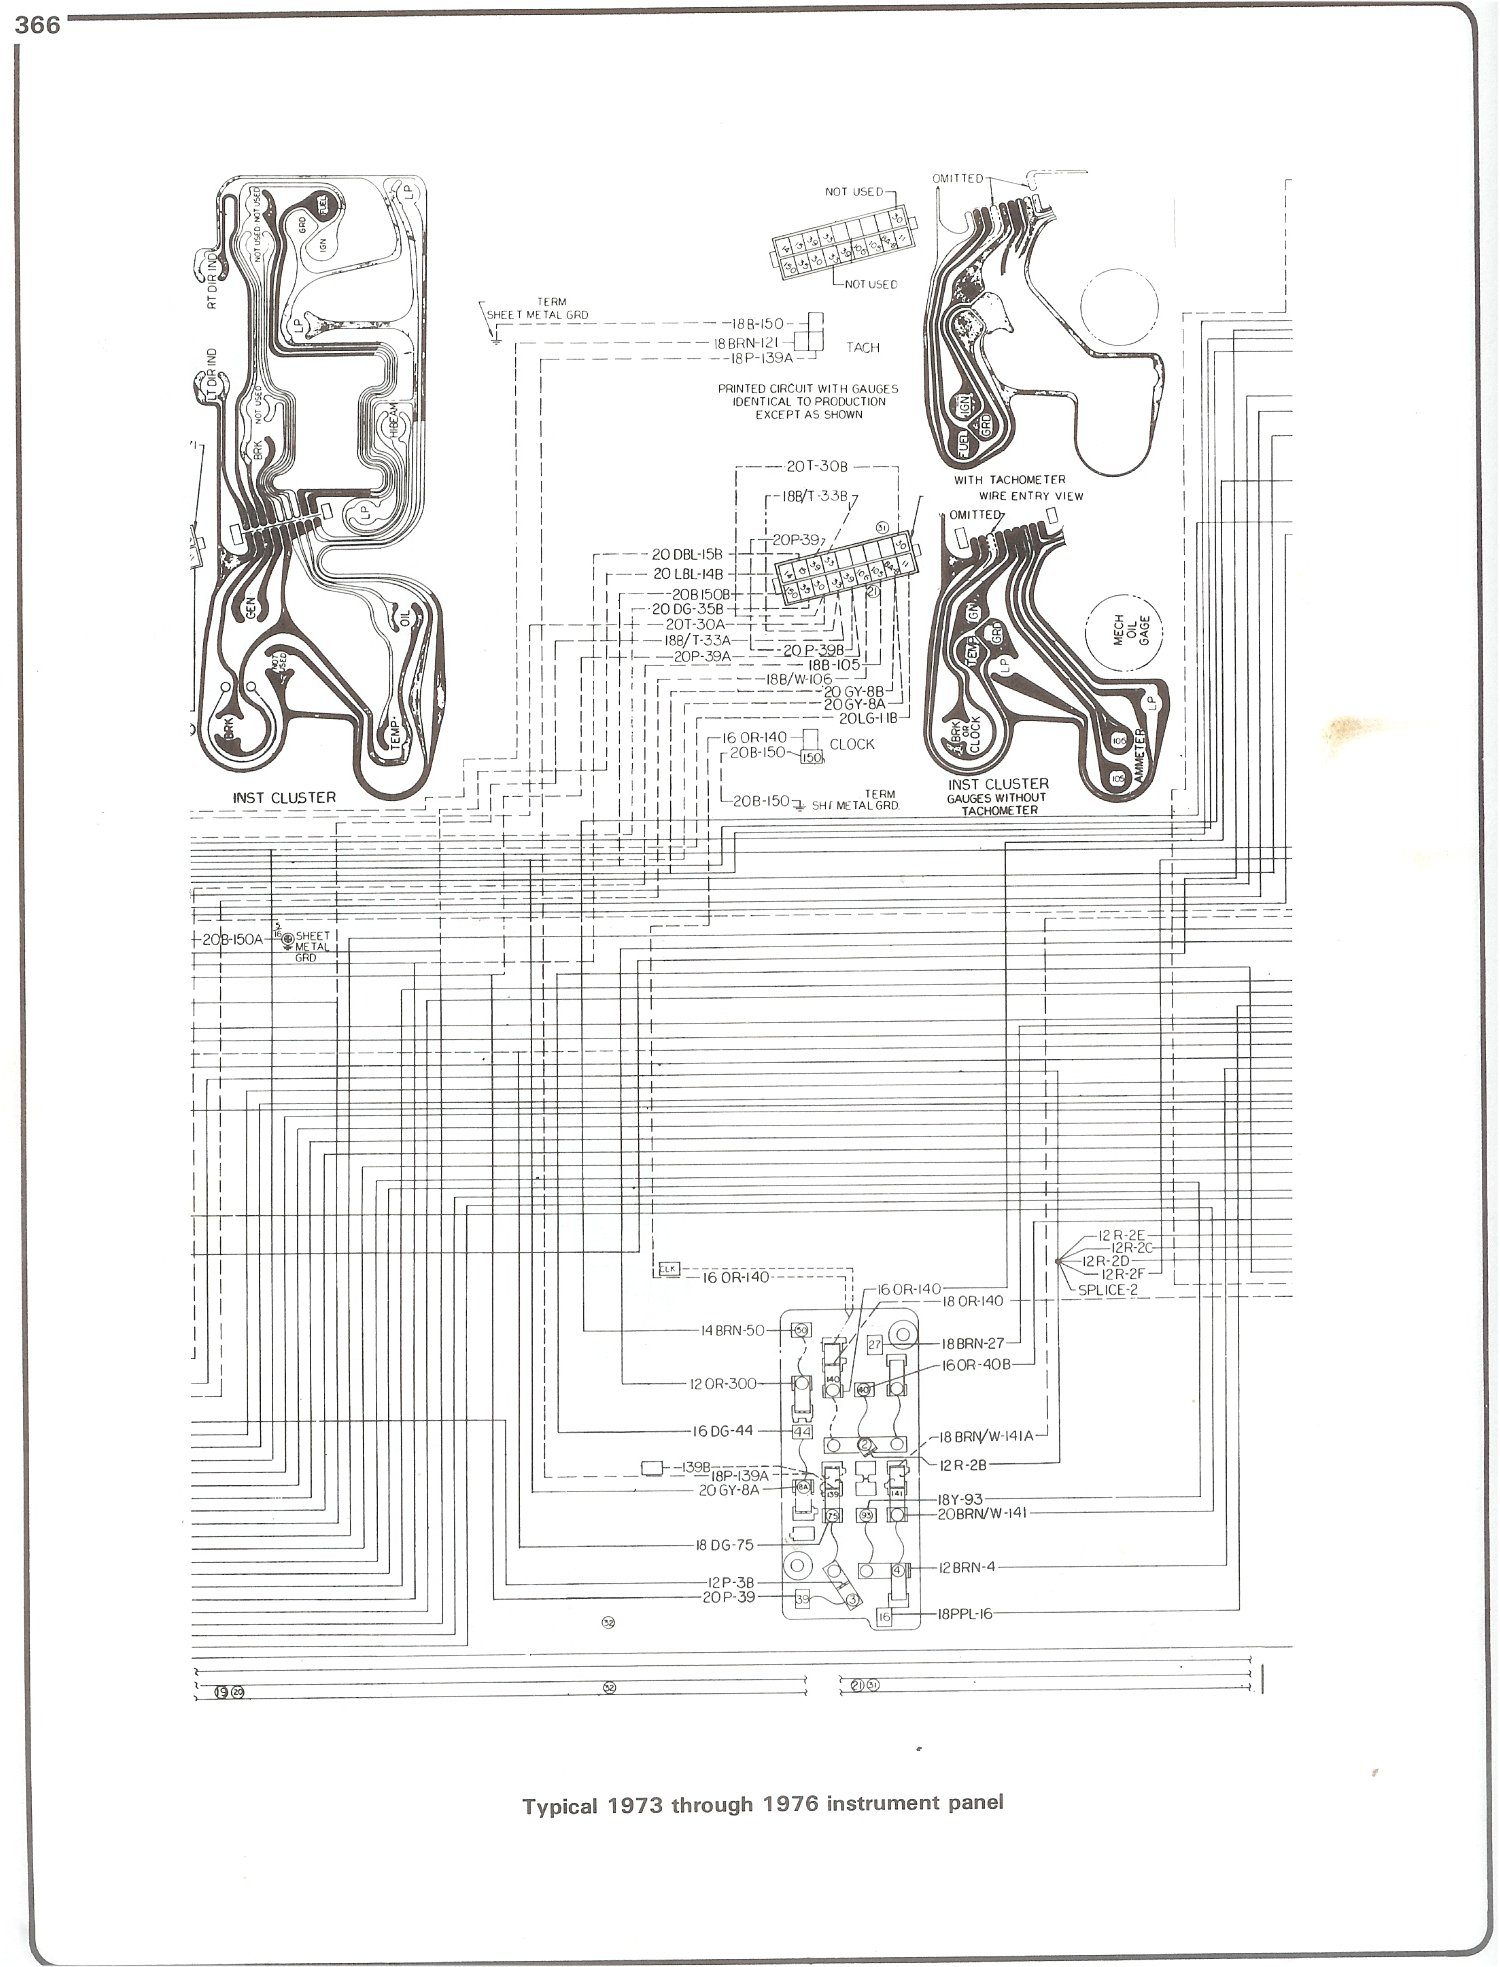 Chevy Scottsdale Wiring Diagram